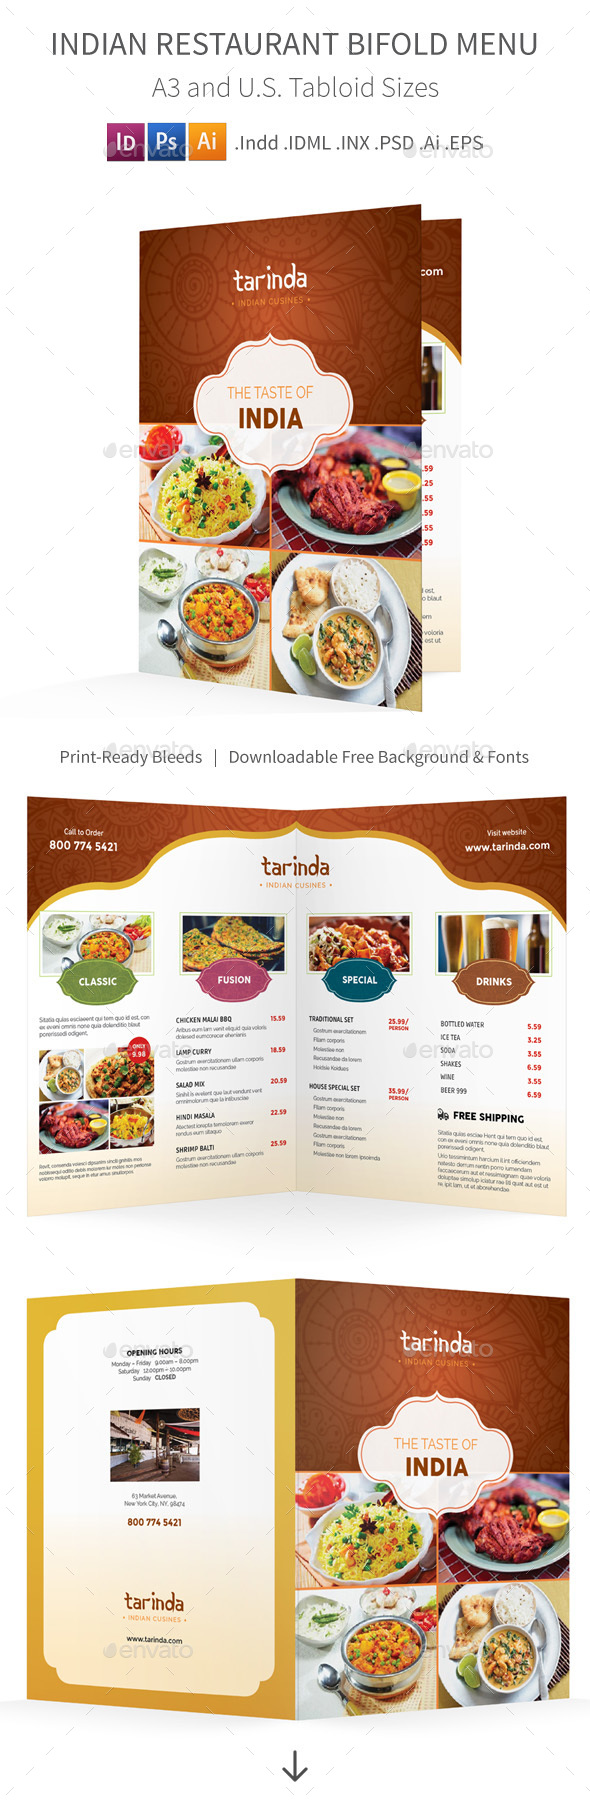 Indian Restaurant Bifold / Halffold Menu - Food Menus Print Templates